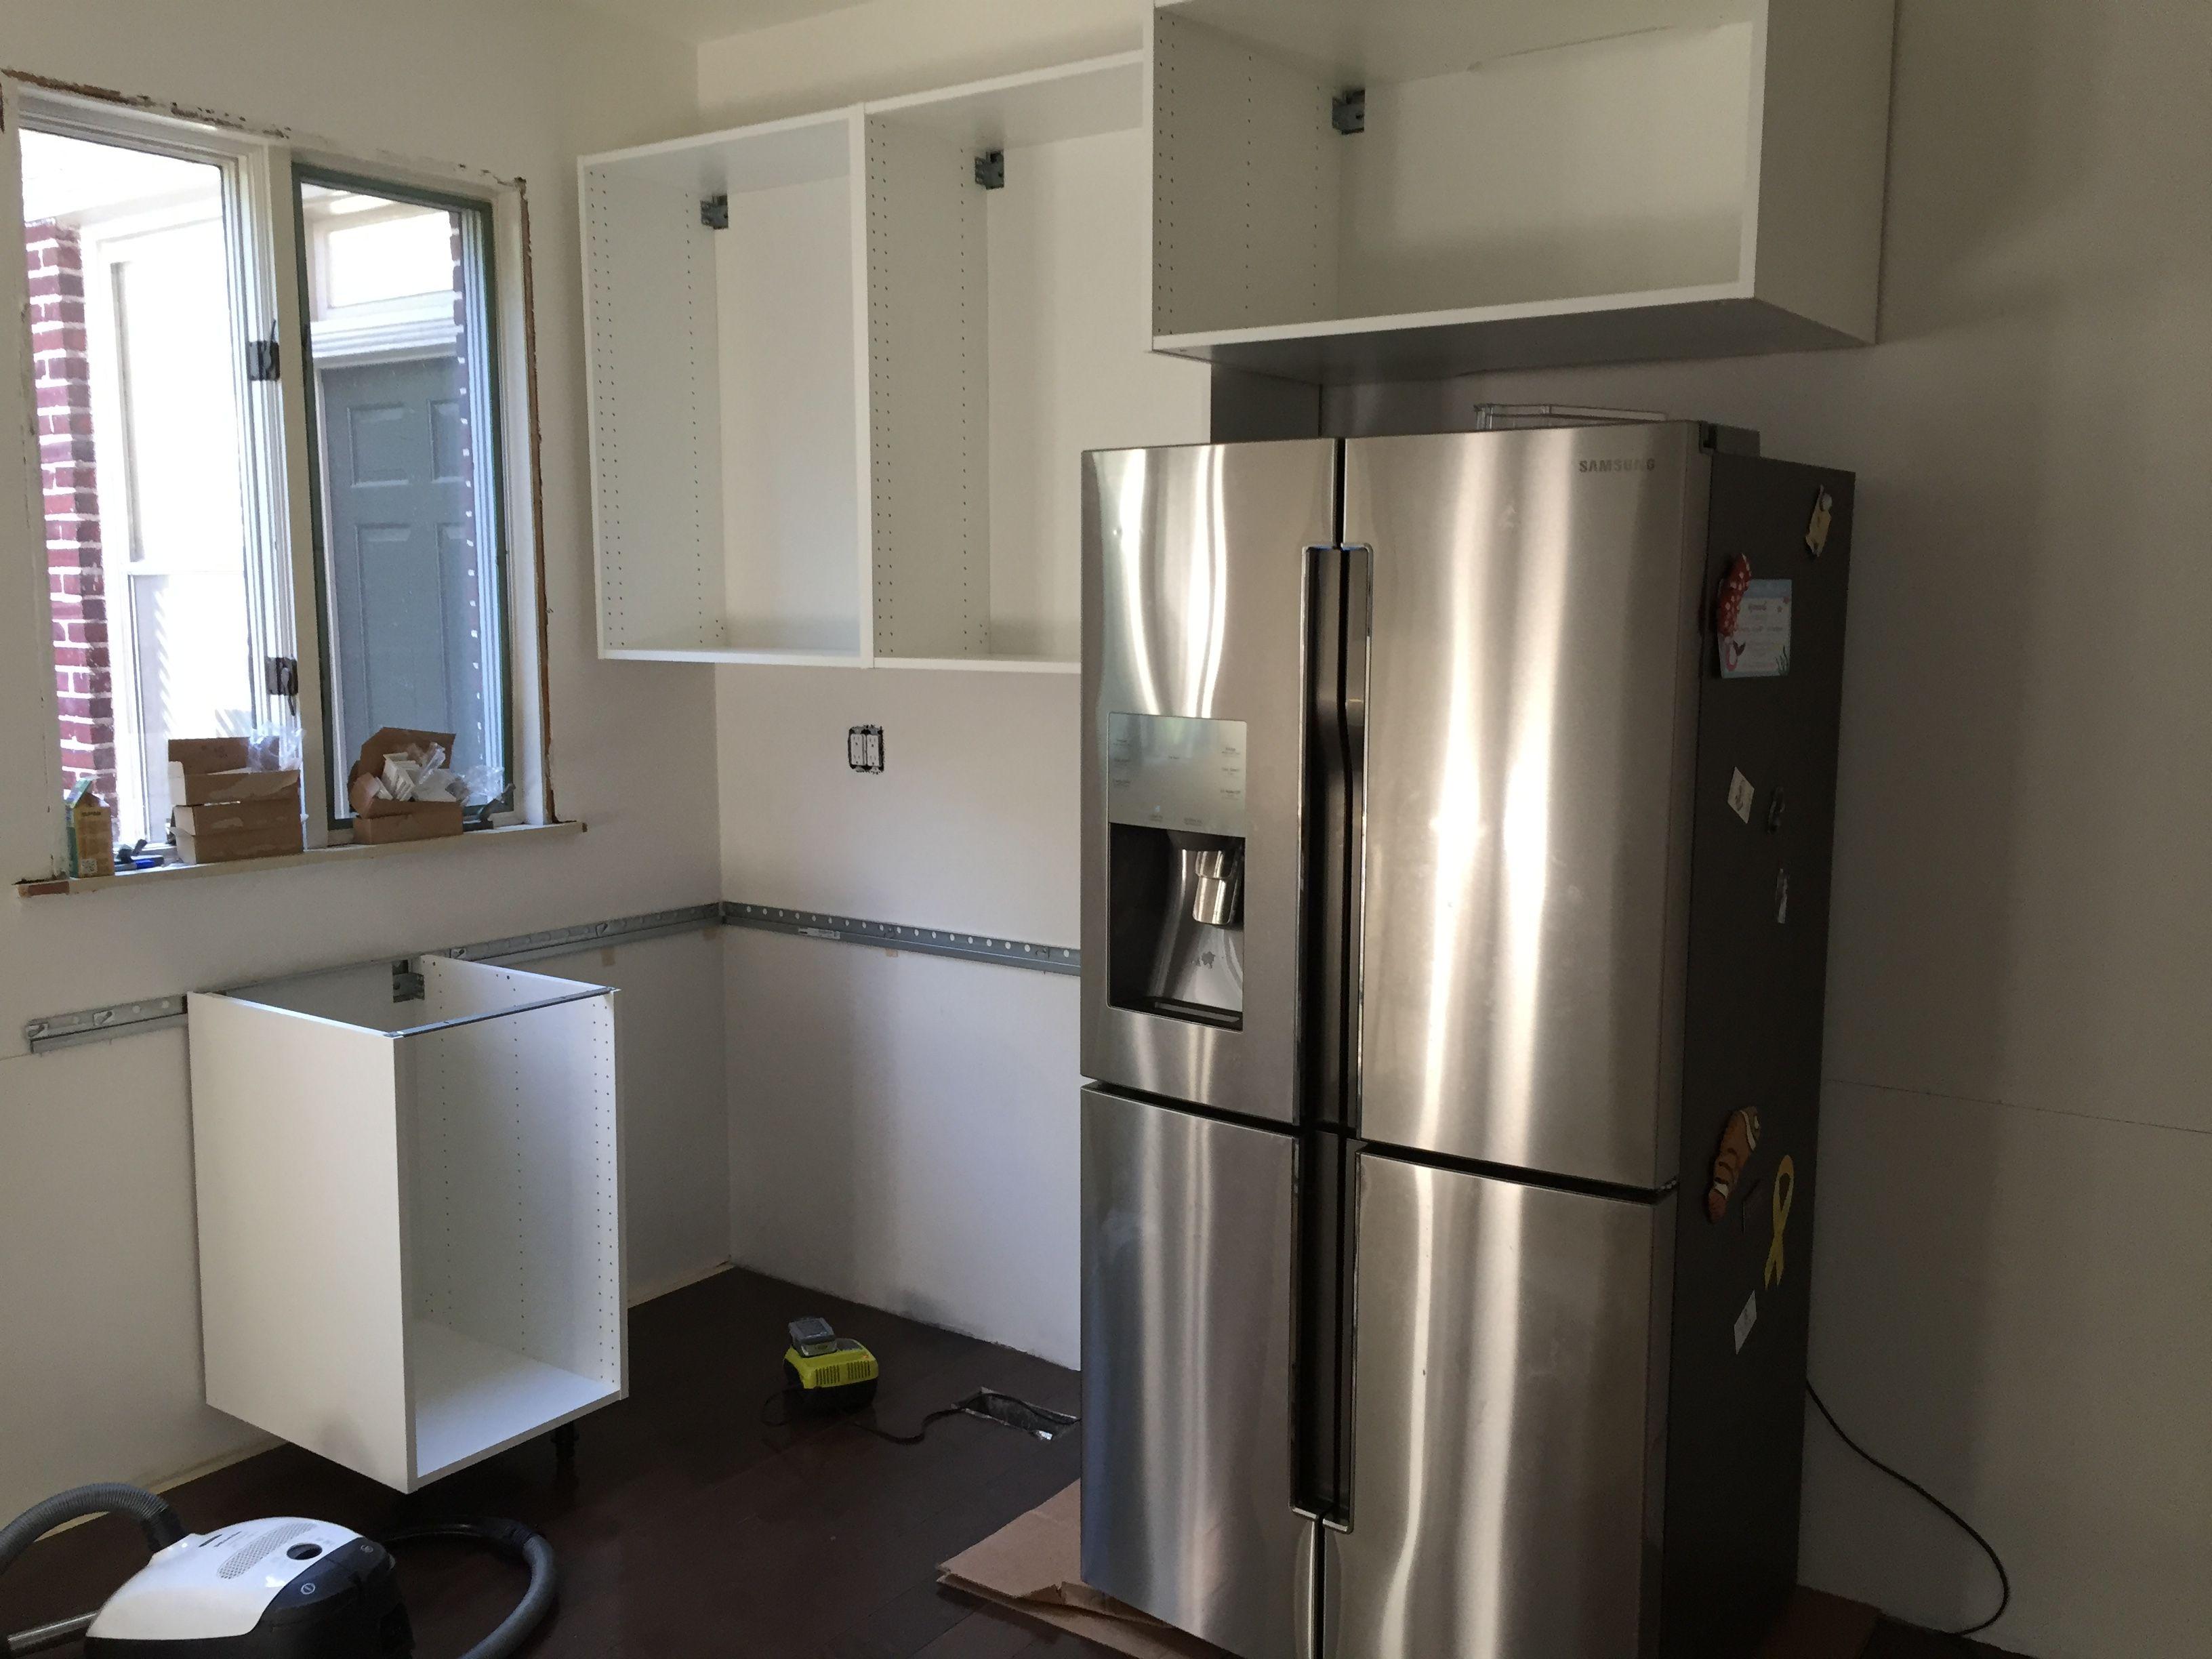 Ikea Küchenrollenhalter ~ Hanging the ikea kitchen cabinets inside a real ikea kitchen